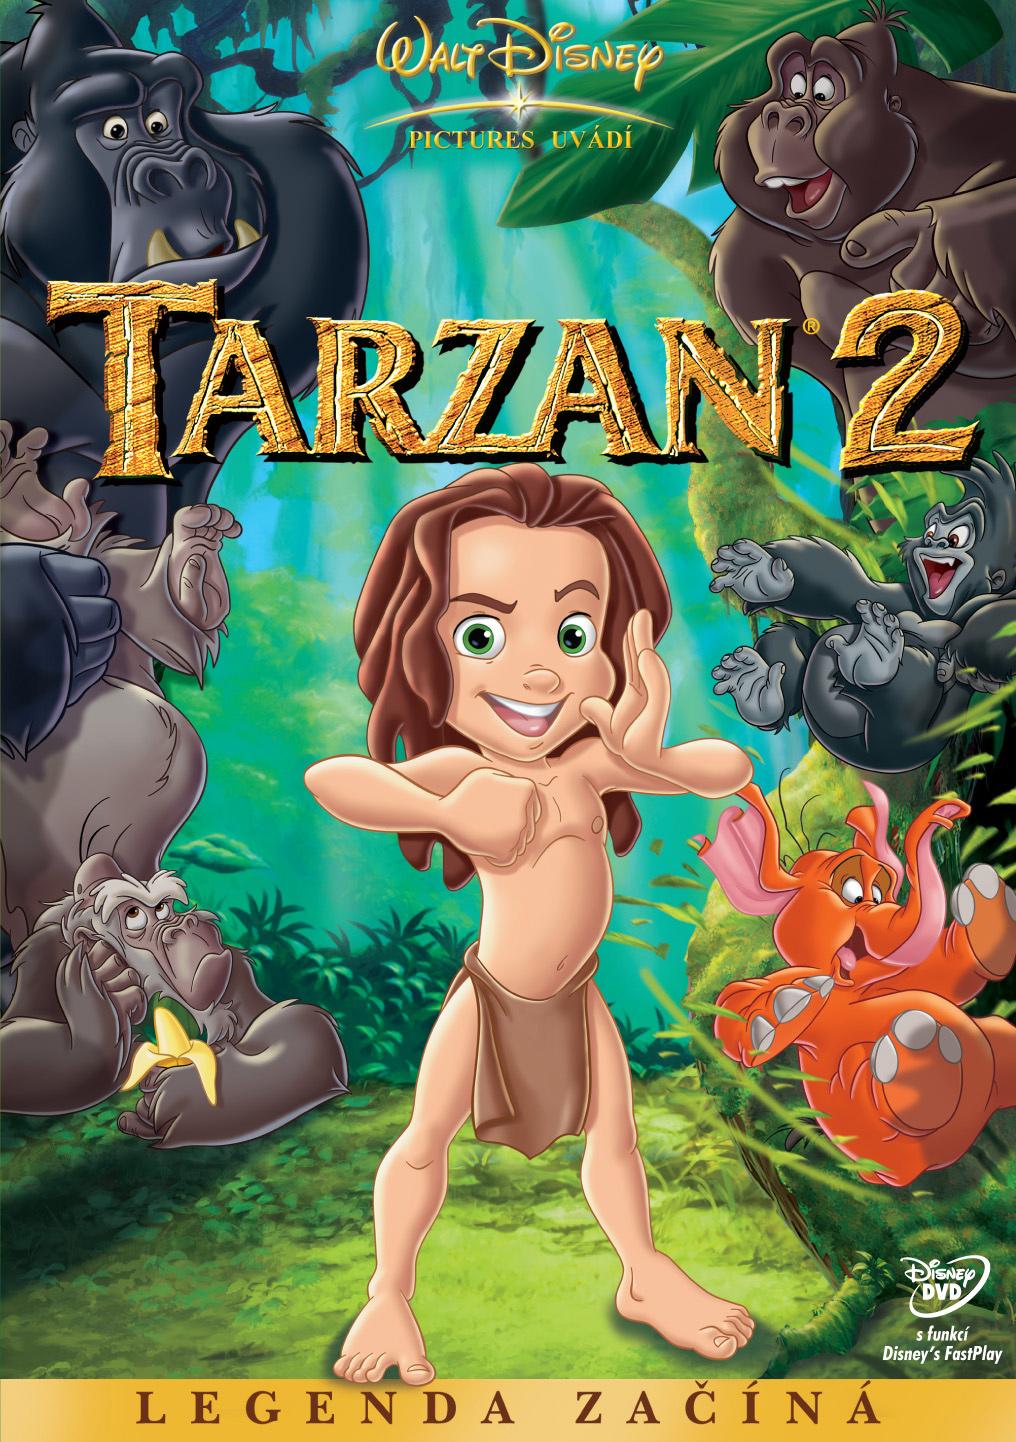 Spustit online film zdarma Tarzan 2